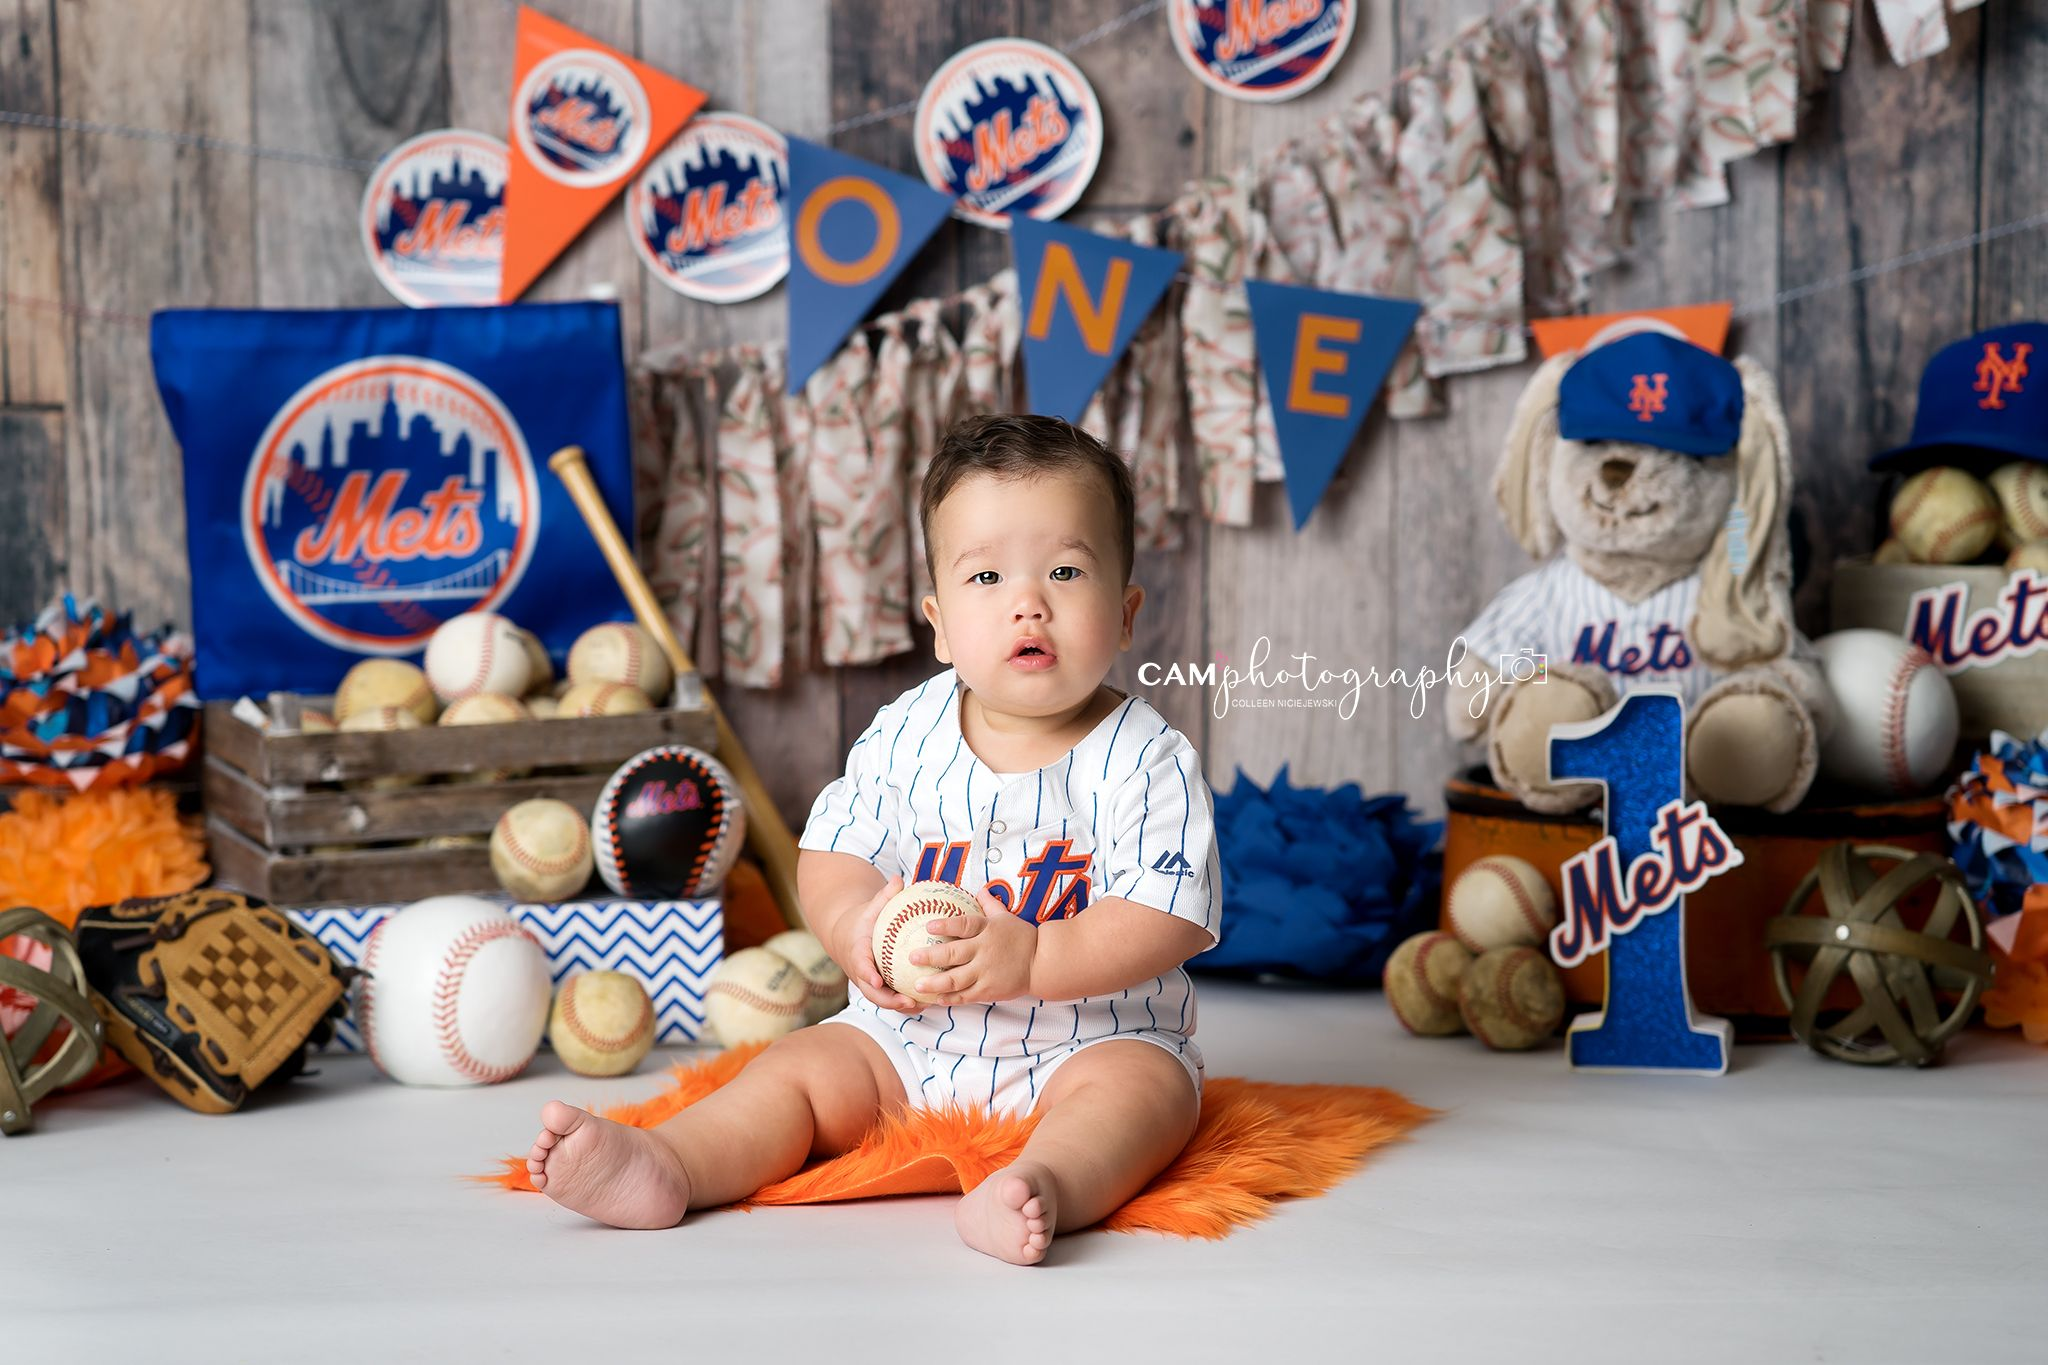 Cake smash photoshoot photography boy sports baseball mets first birthday